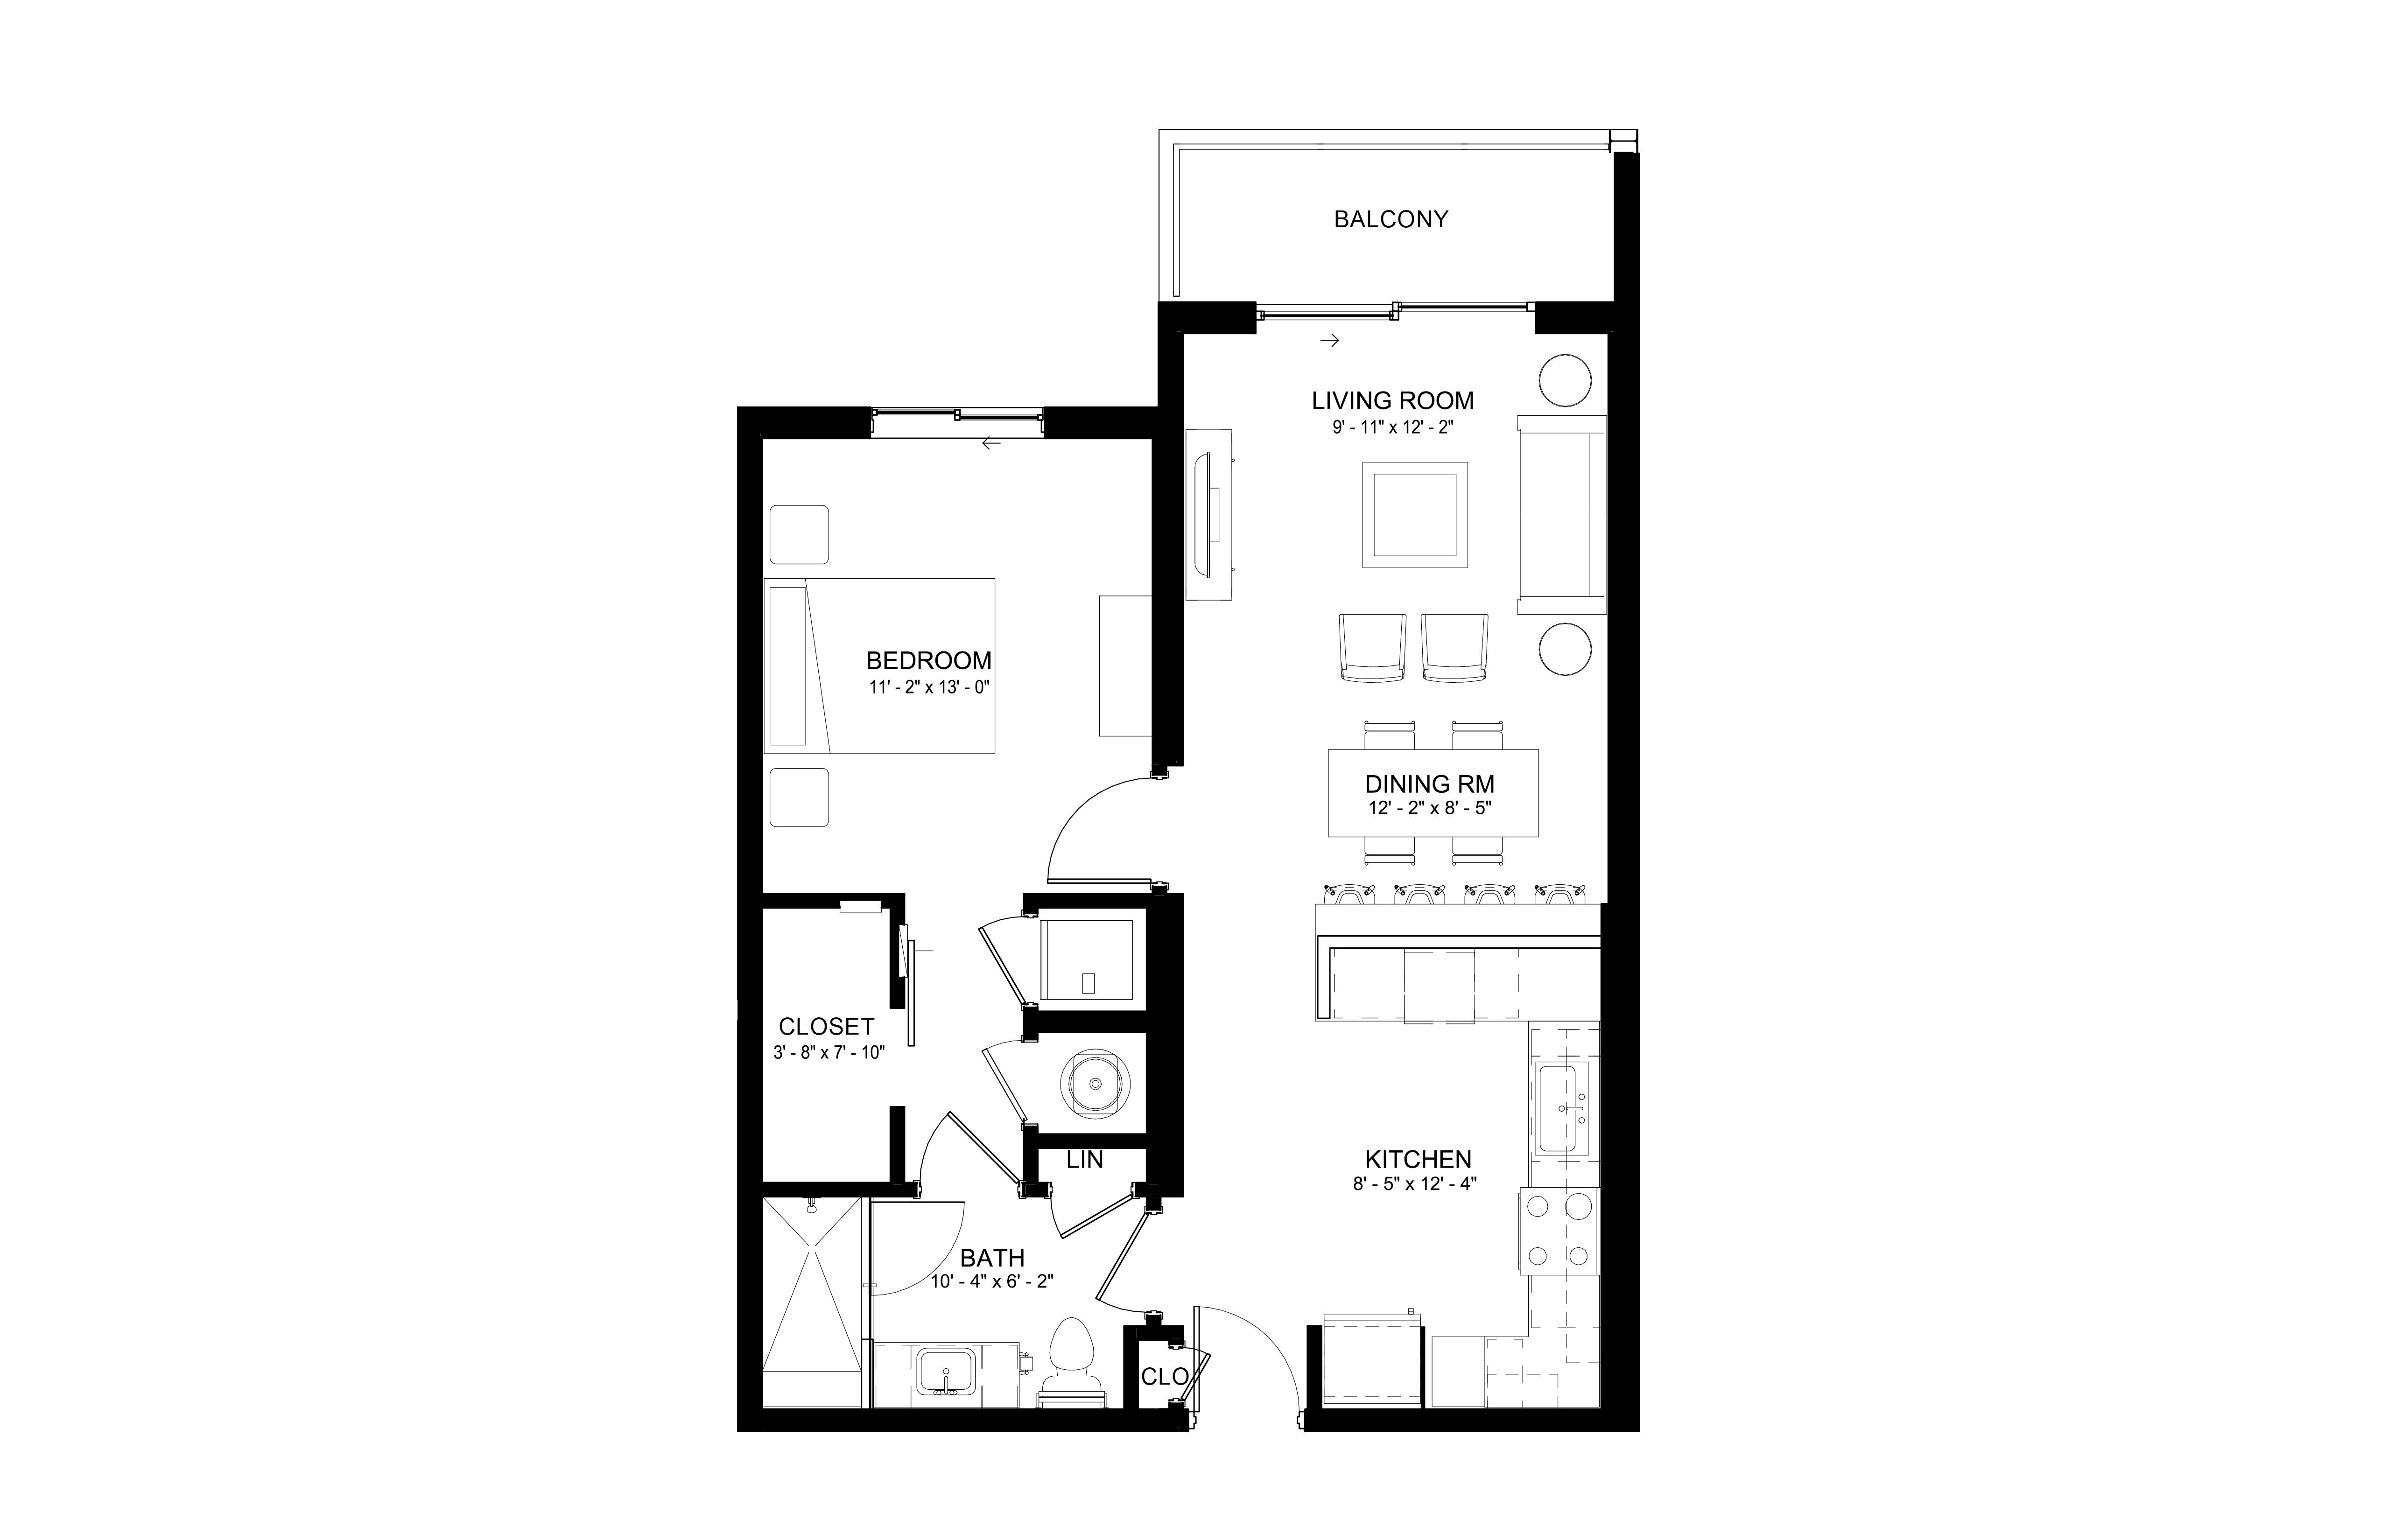 Apartment 203 floorplan